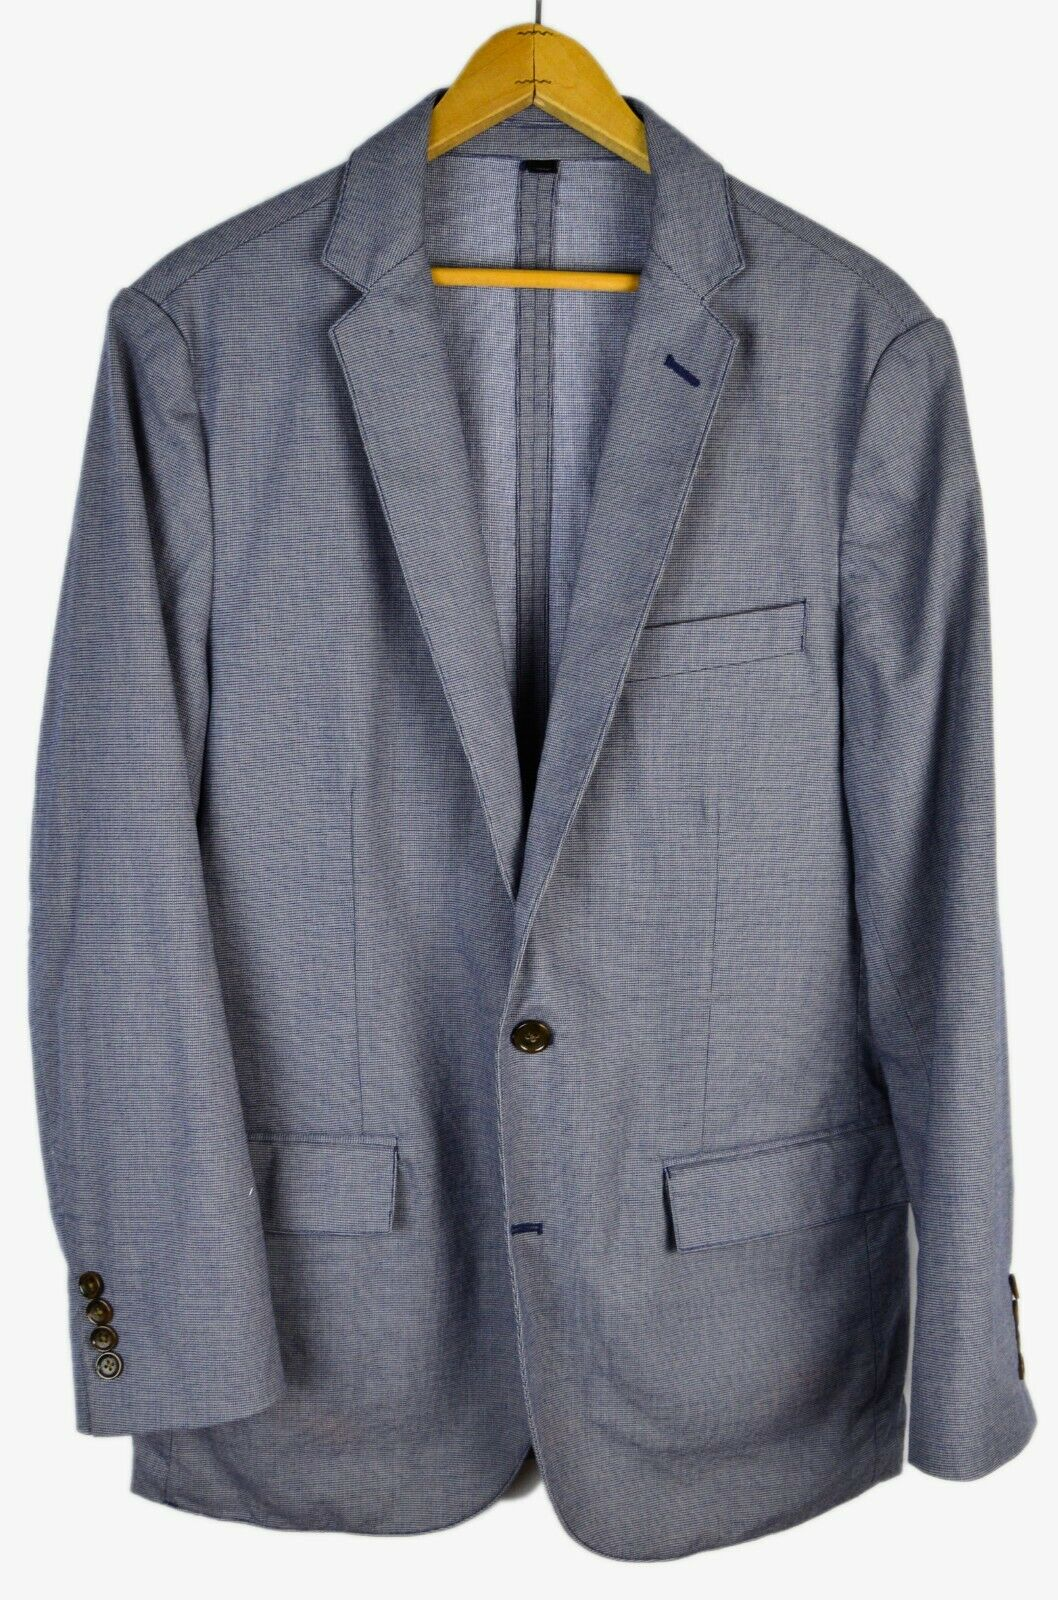 J. Crew Slate bluee Houndstooth Cotton Blend Slim Fit Dual Vent Sport Coat S